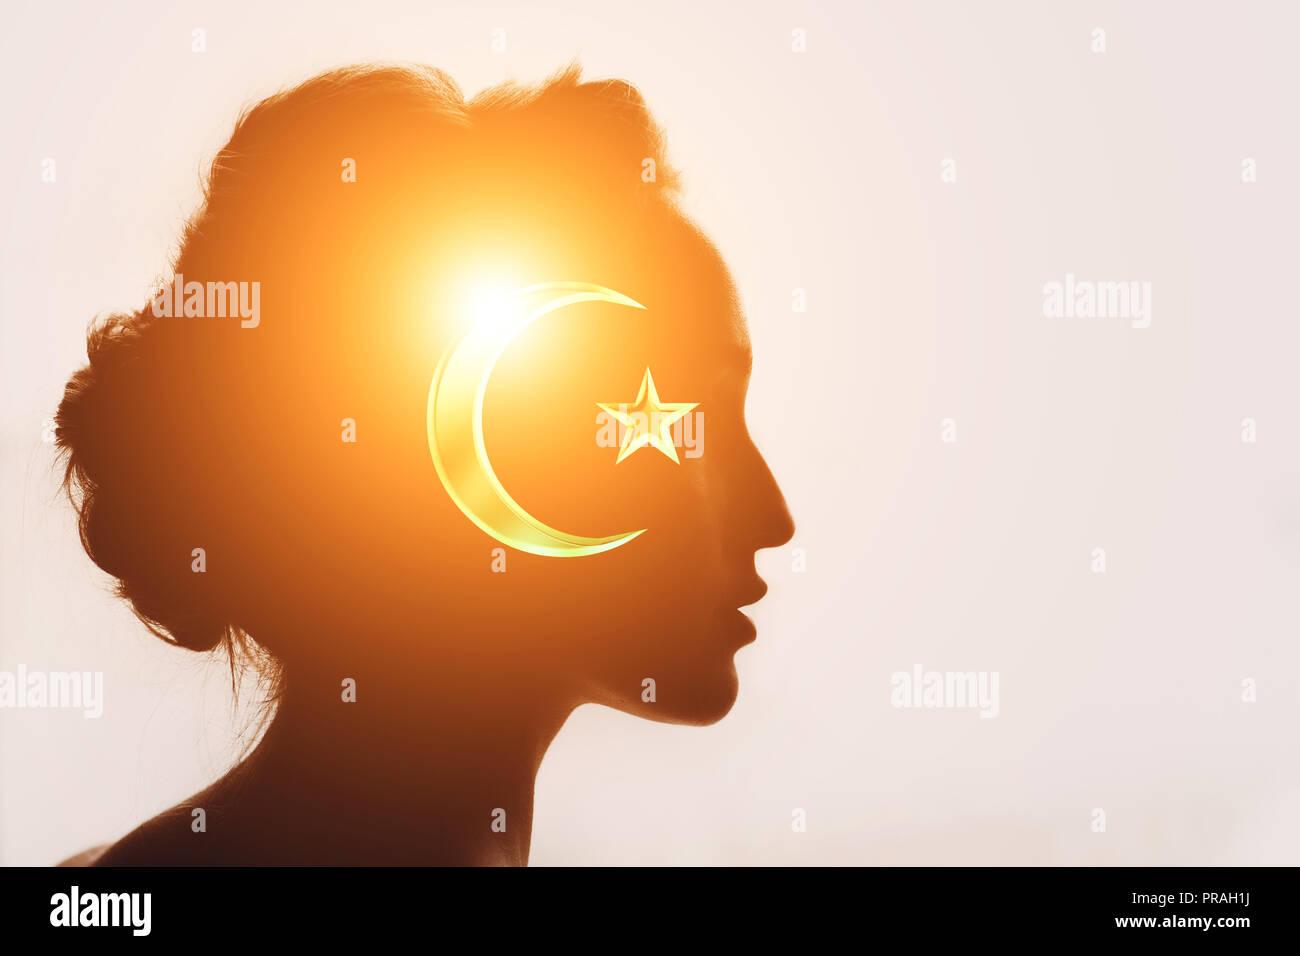 Islam Praying Stock Photos Amp Islam Praying Stock Images